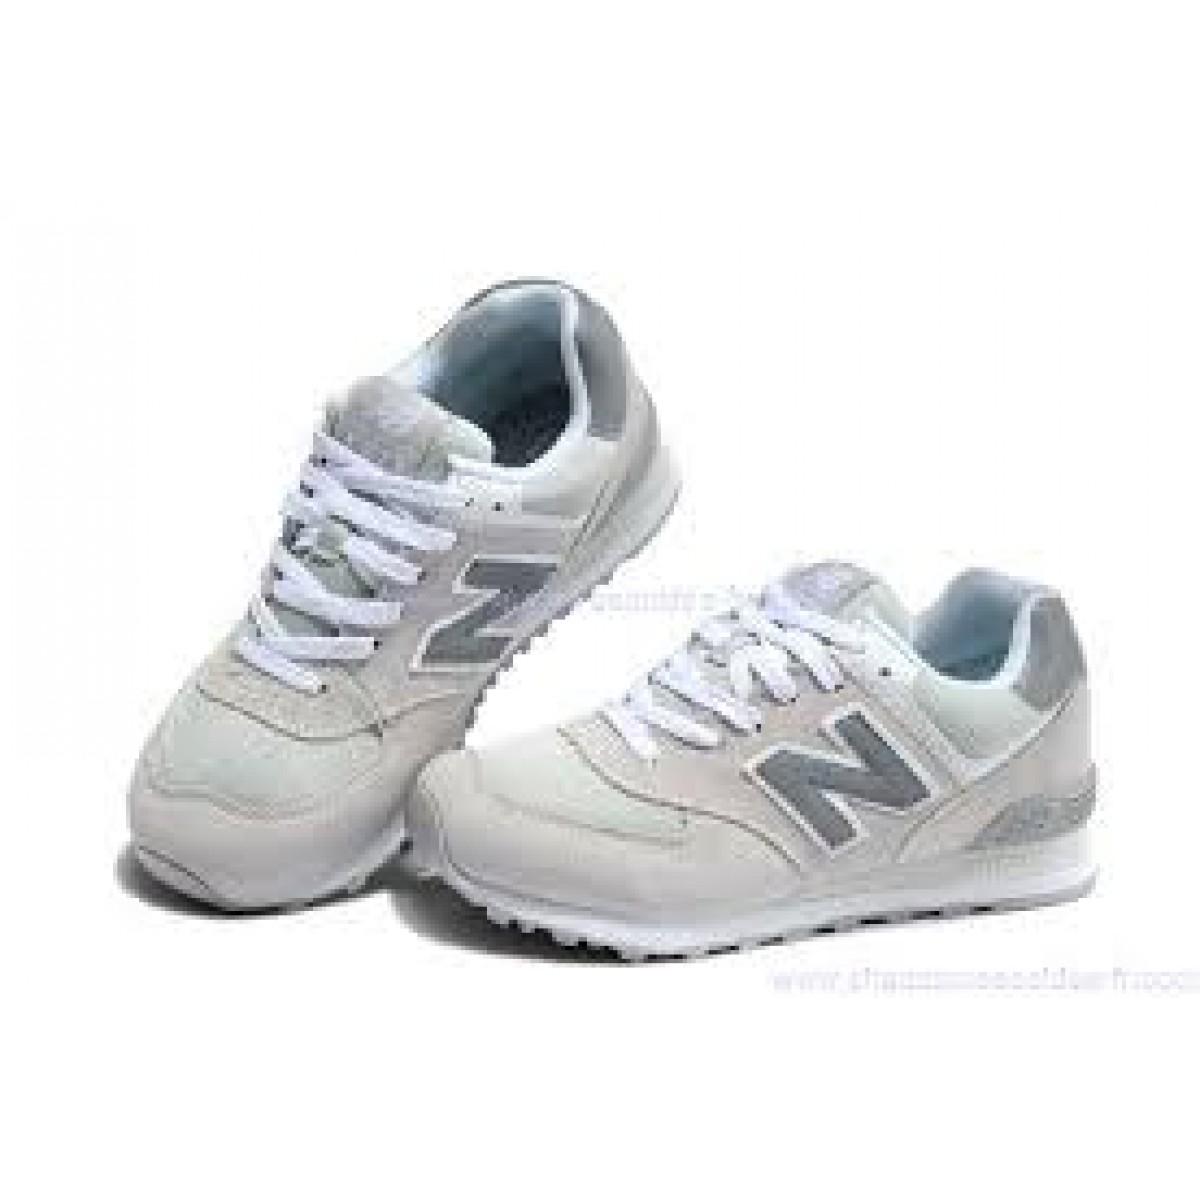 0c7922dd733a Achat / Vente produits New Balance 574 Femme,Président Chaussures New  Balance 574 Femme Pas